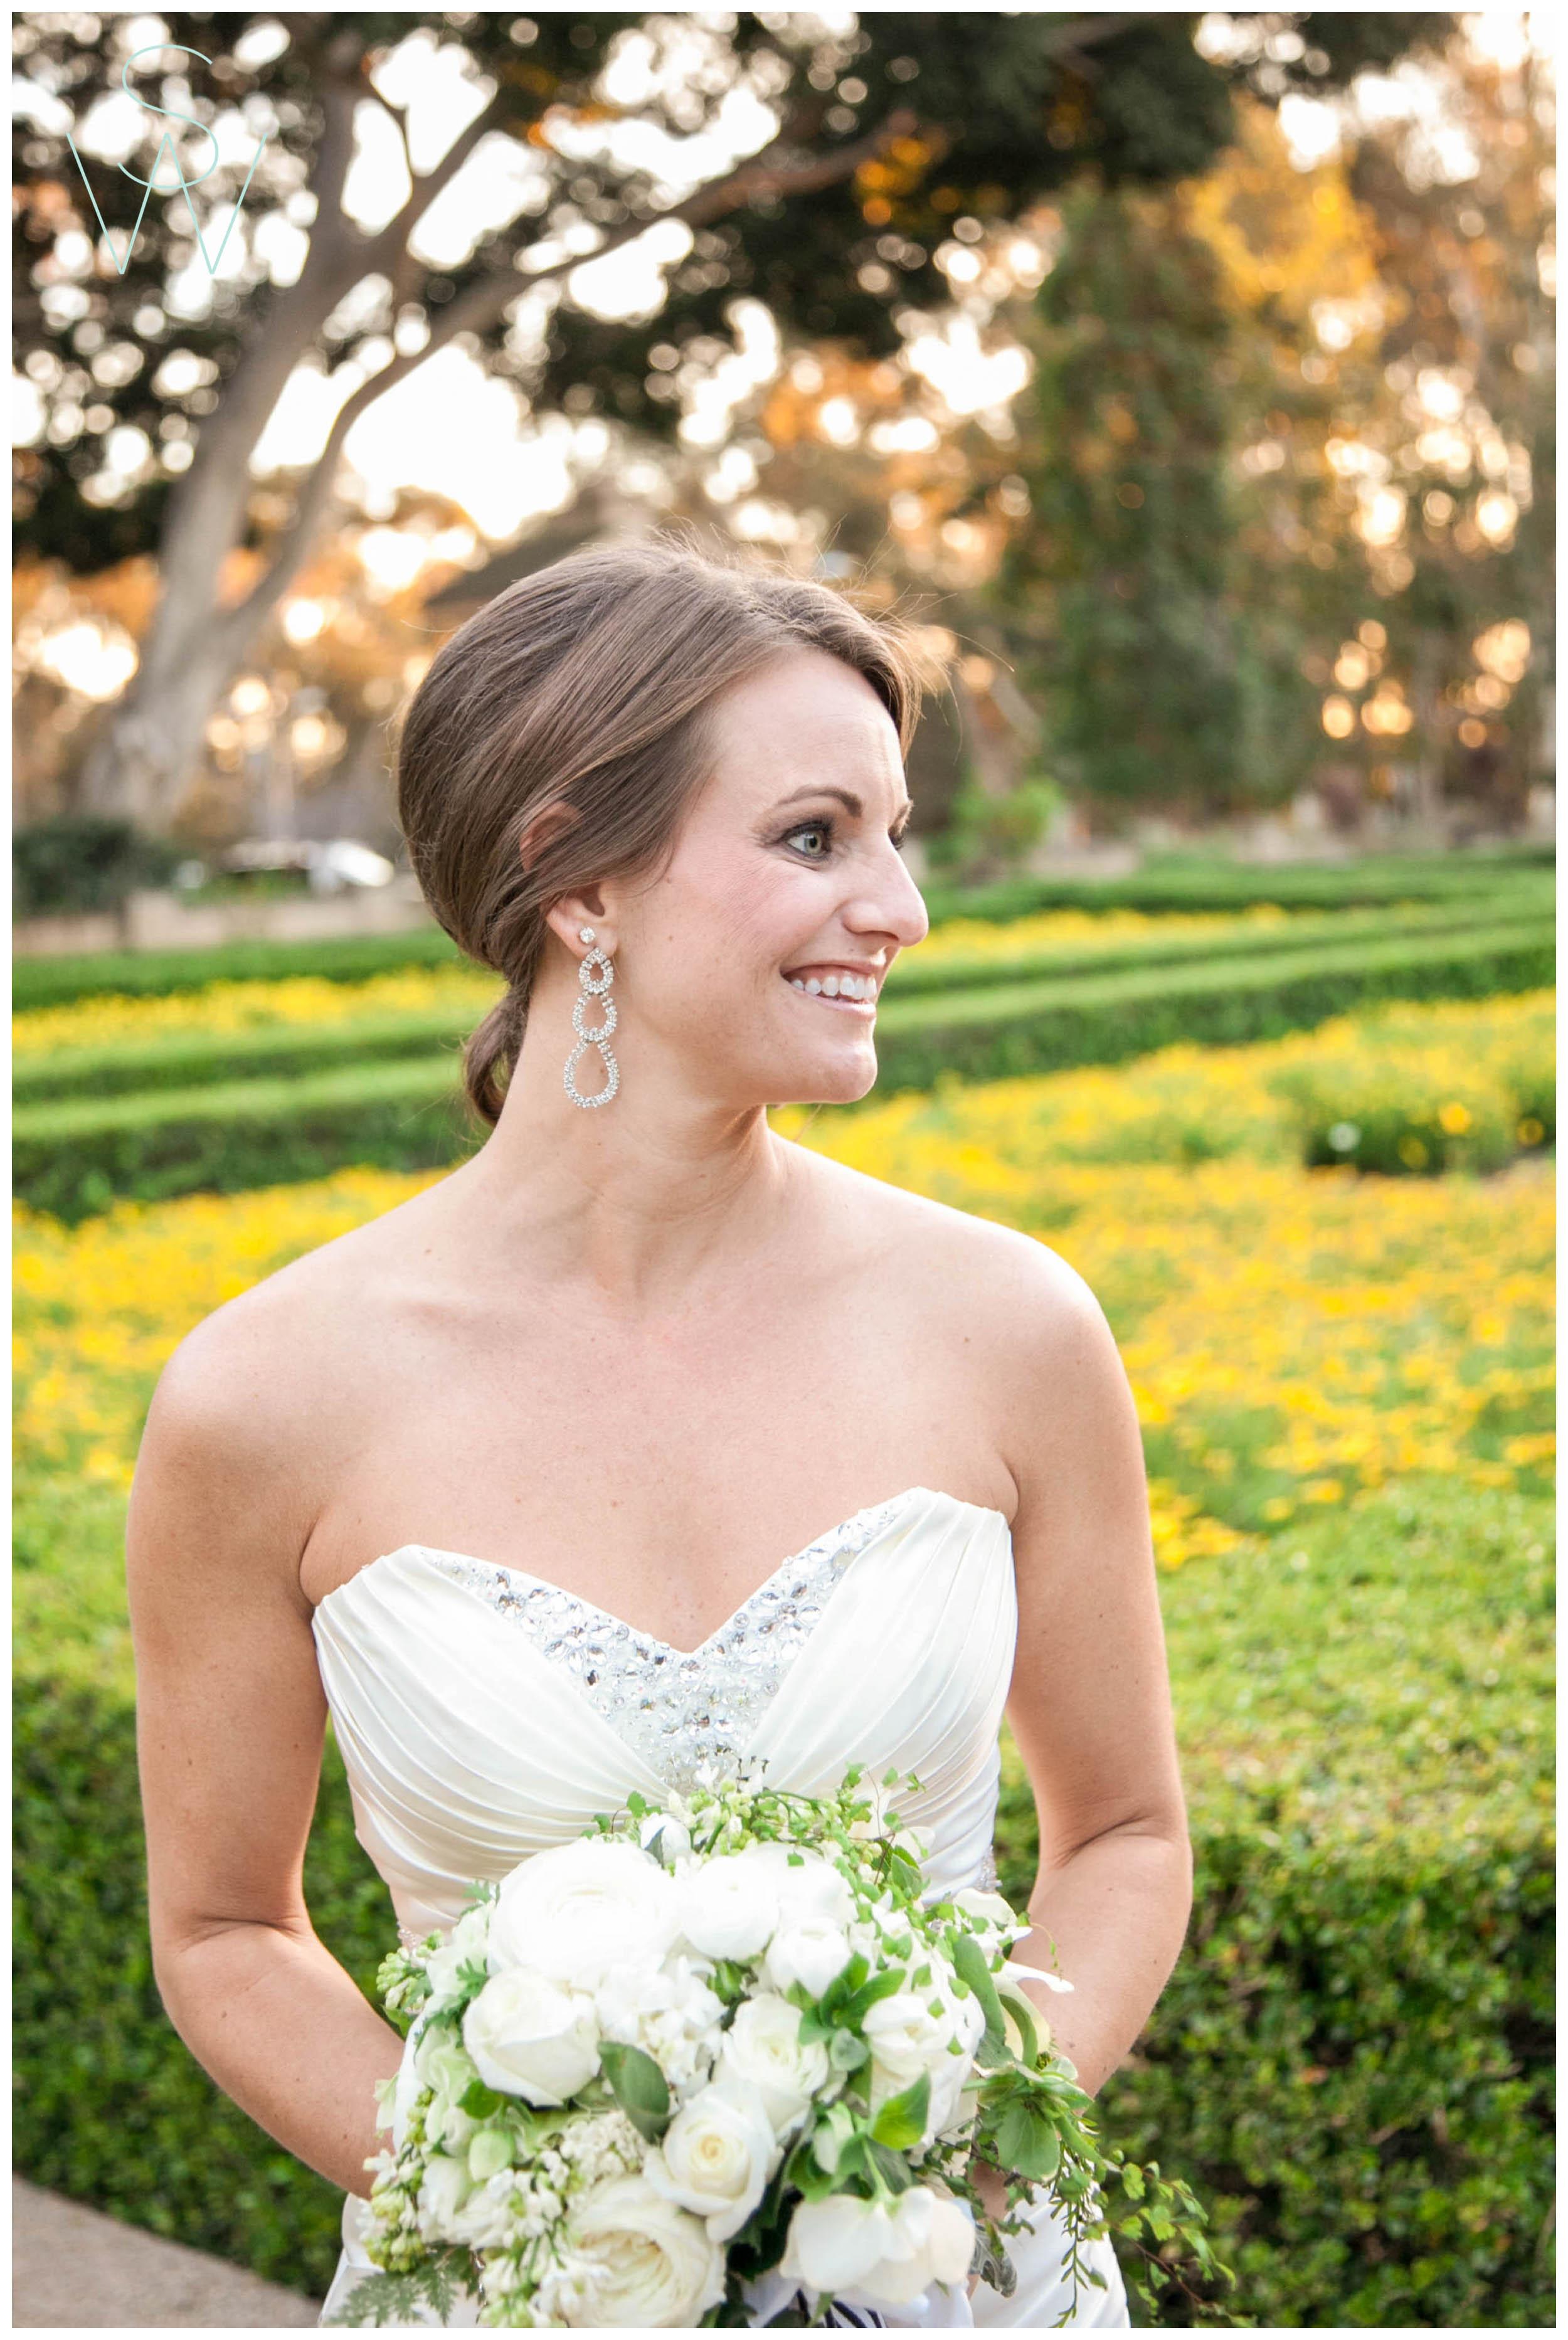 Shewanders.sdma_.wedding.photography-1036.jpg.wedding.photography-1036.jpg